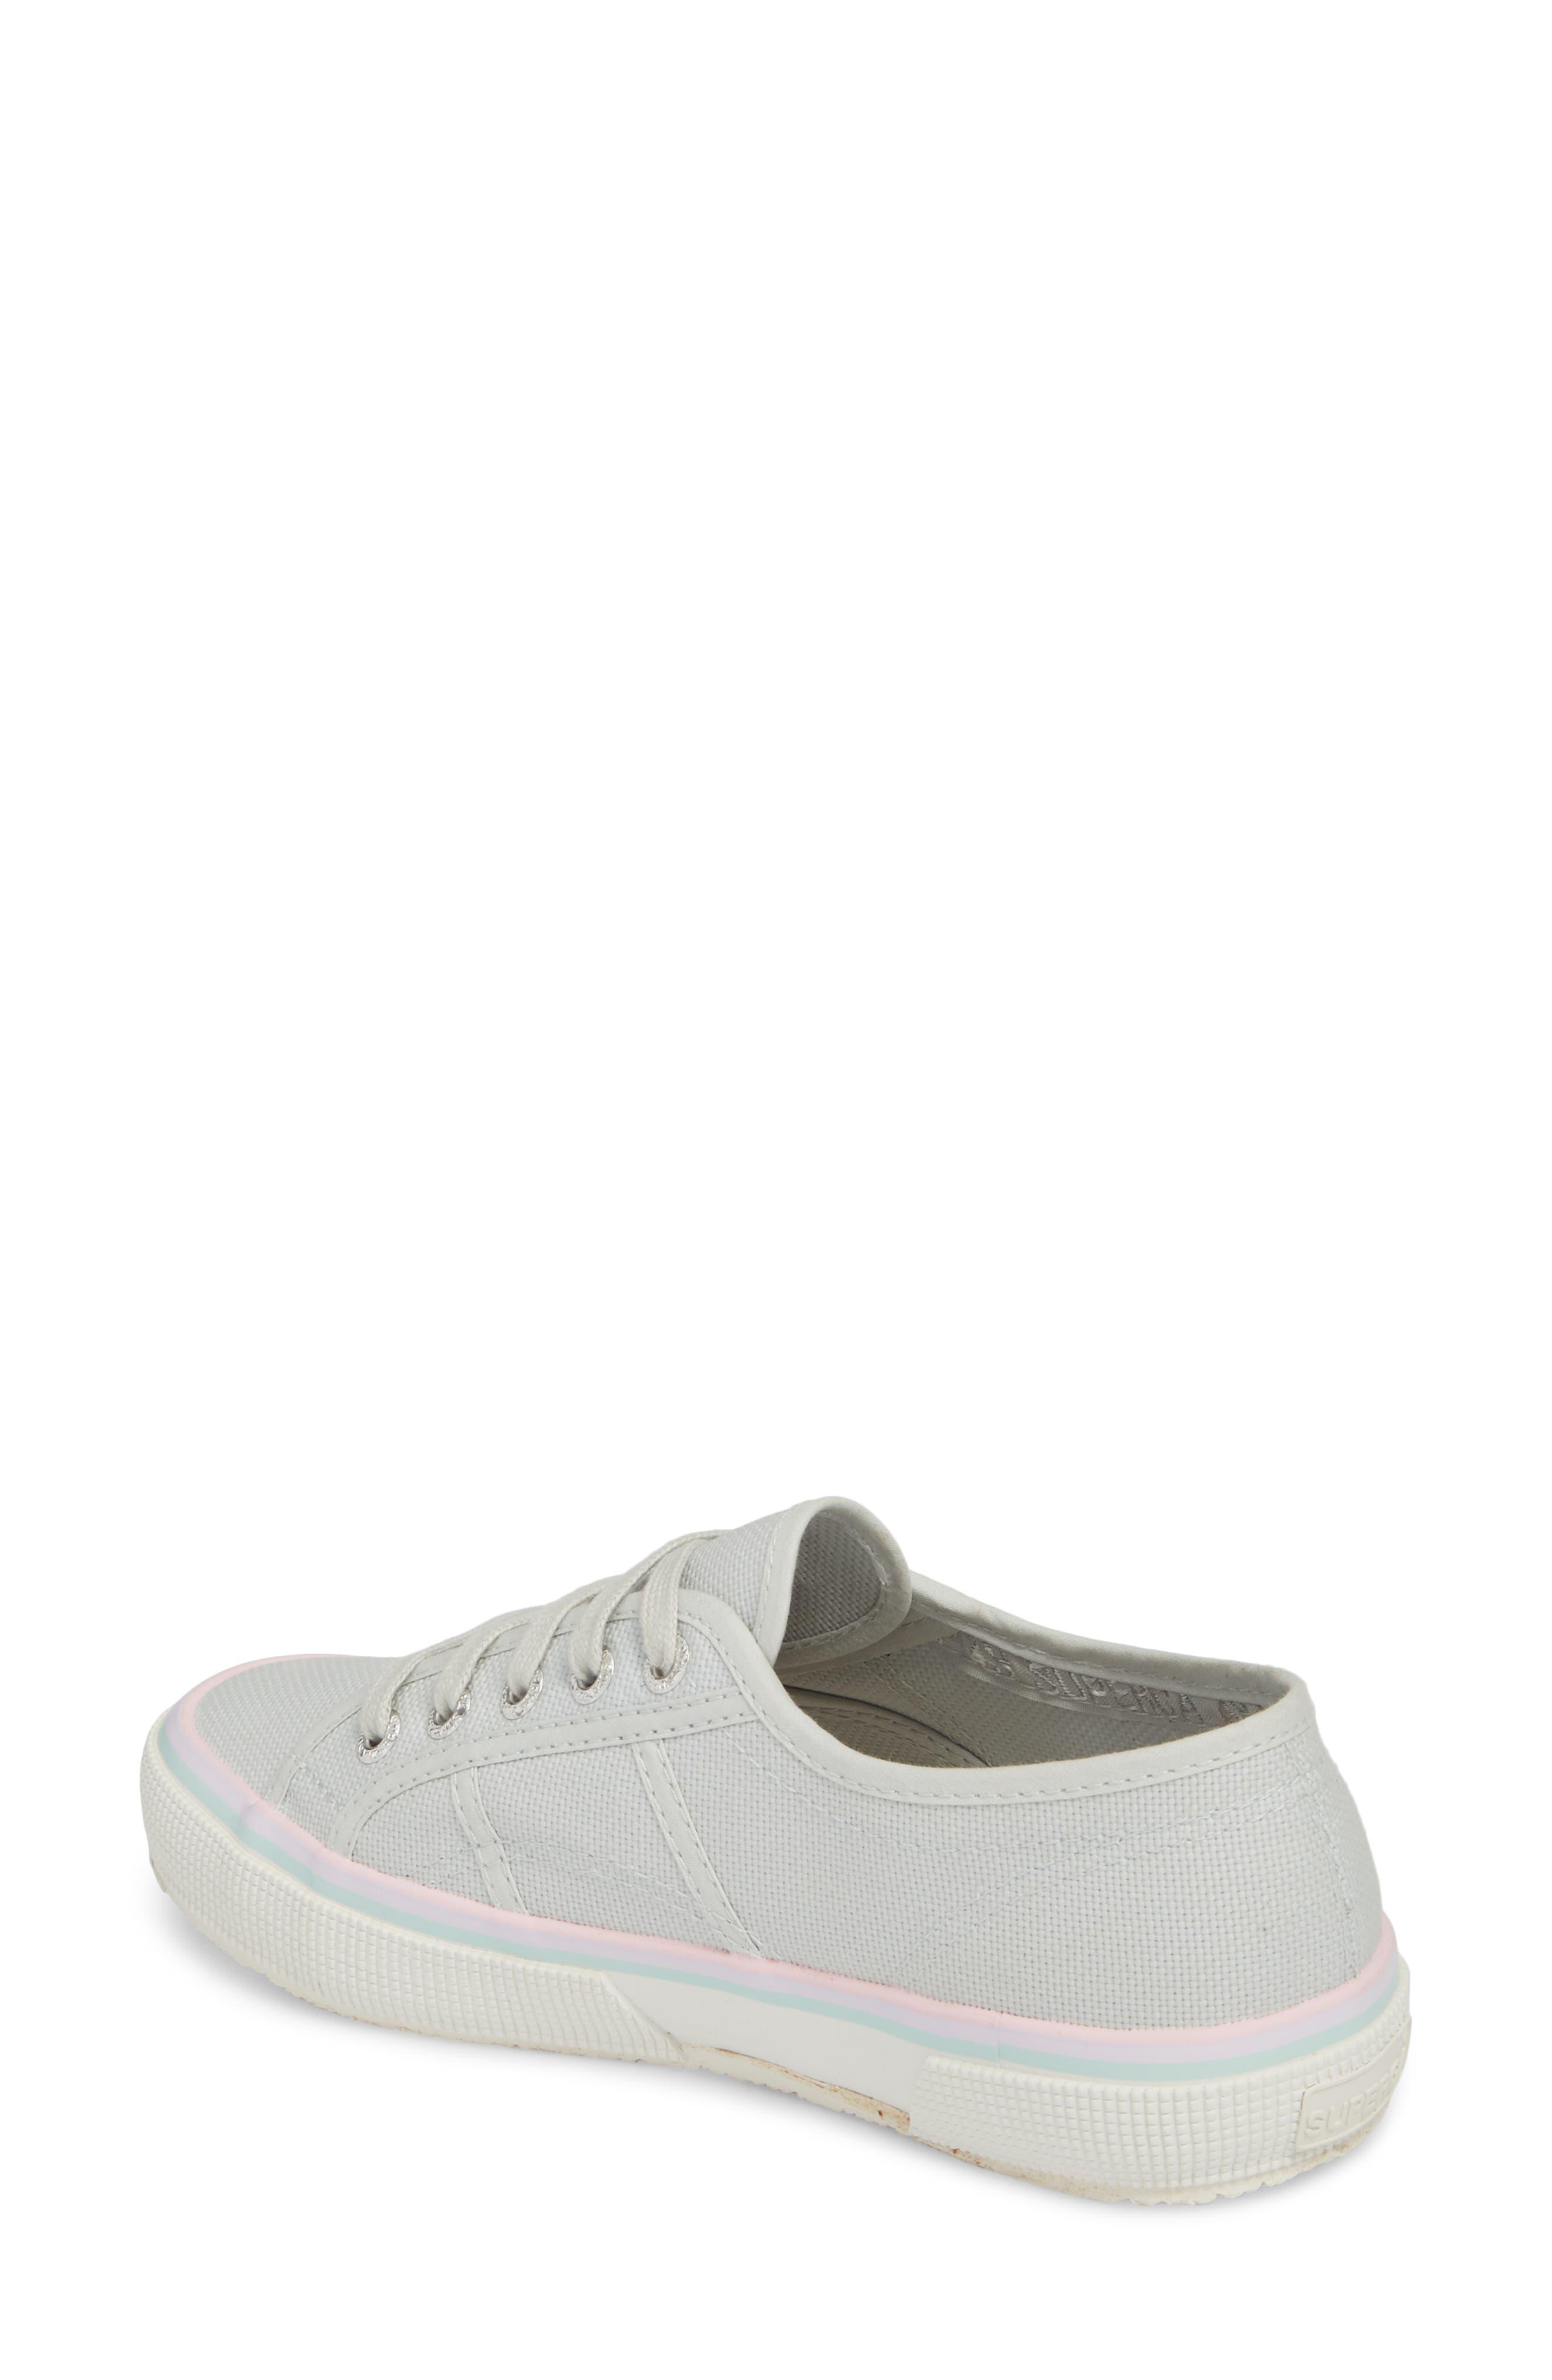 2750 Three-Stripe Sneaker,                             Alternate thumbnail 2, color,                             020